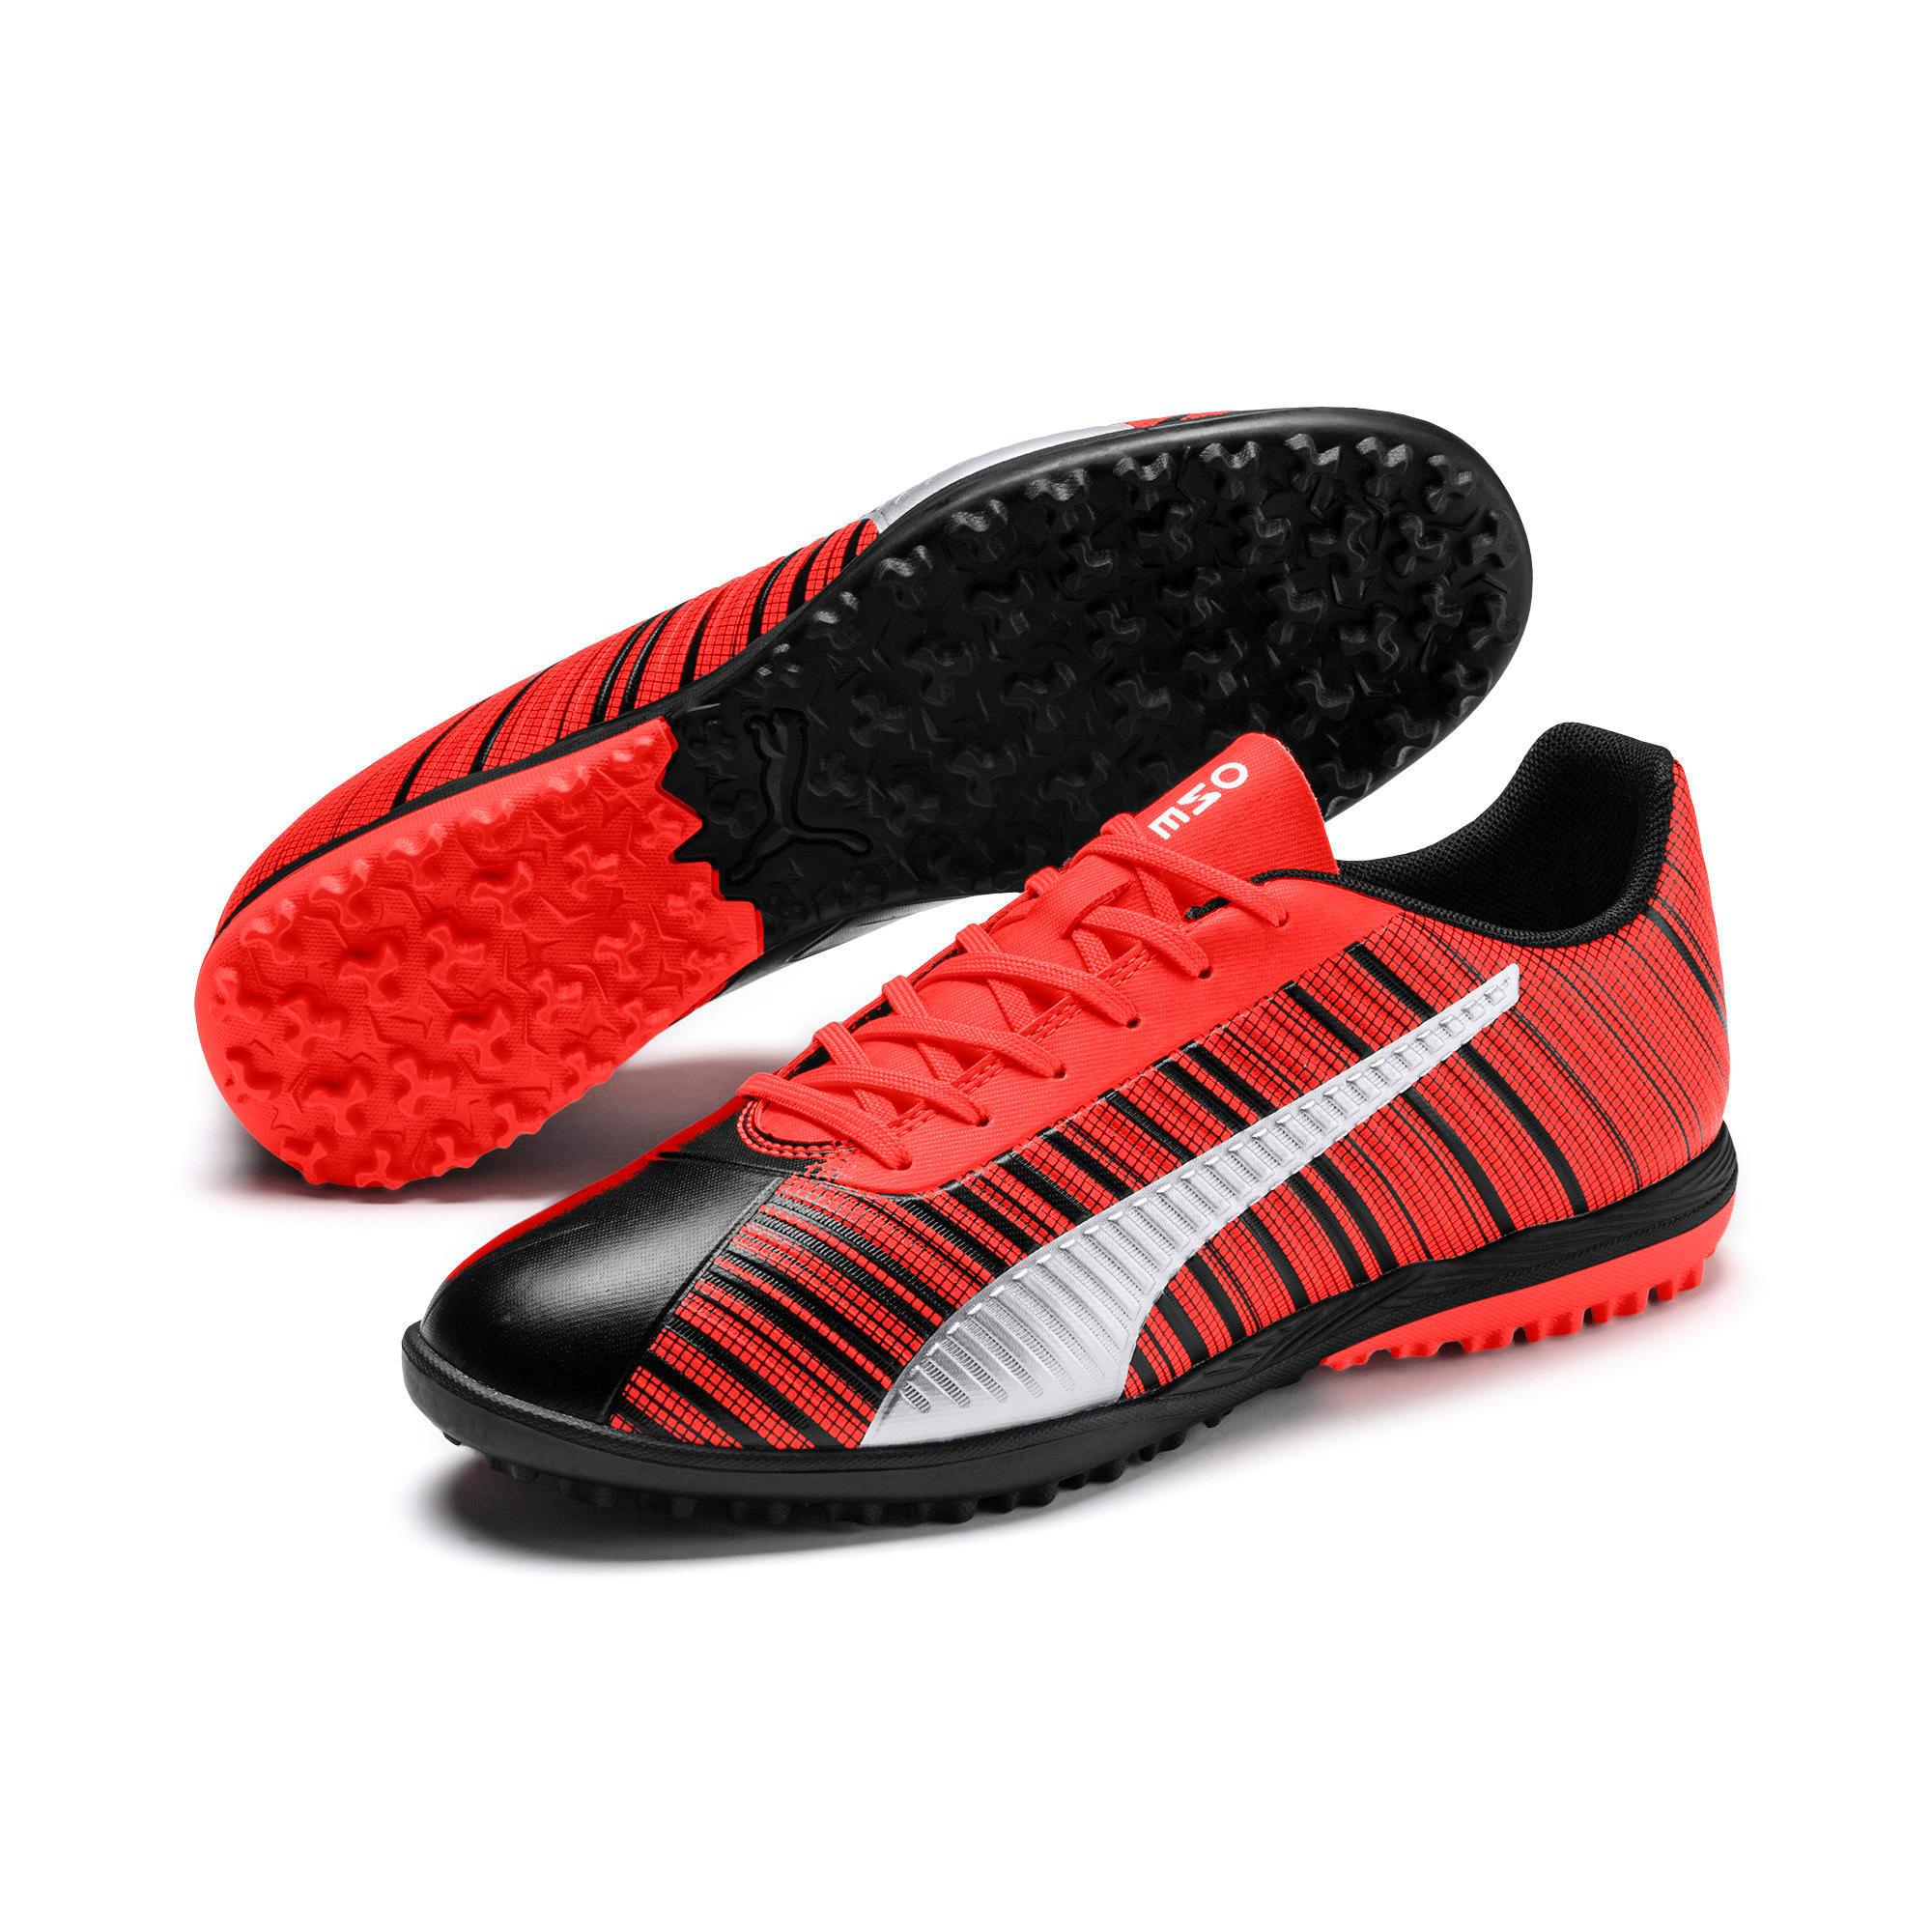 Thumbnail 3 of PUMA ONE 5.4 TT Men's Soccer Shoes, Black-Nrgy Red-Aged Silver, medium